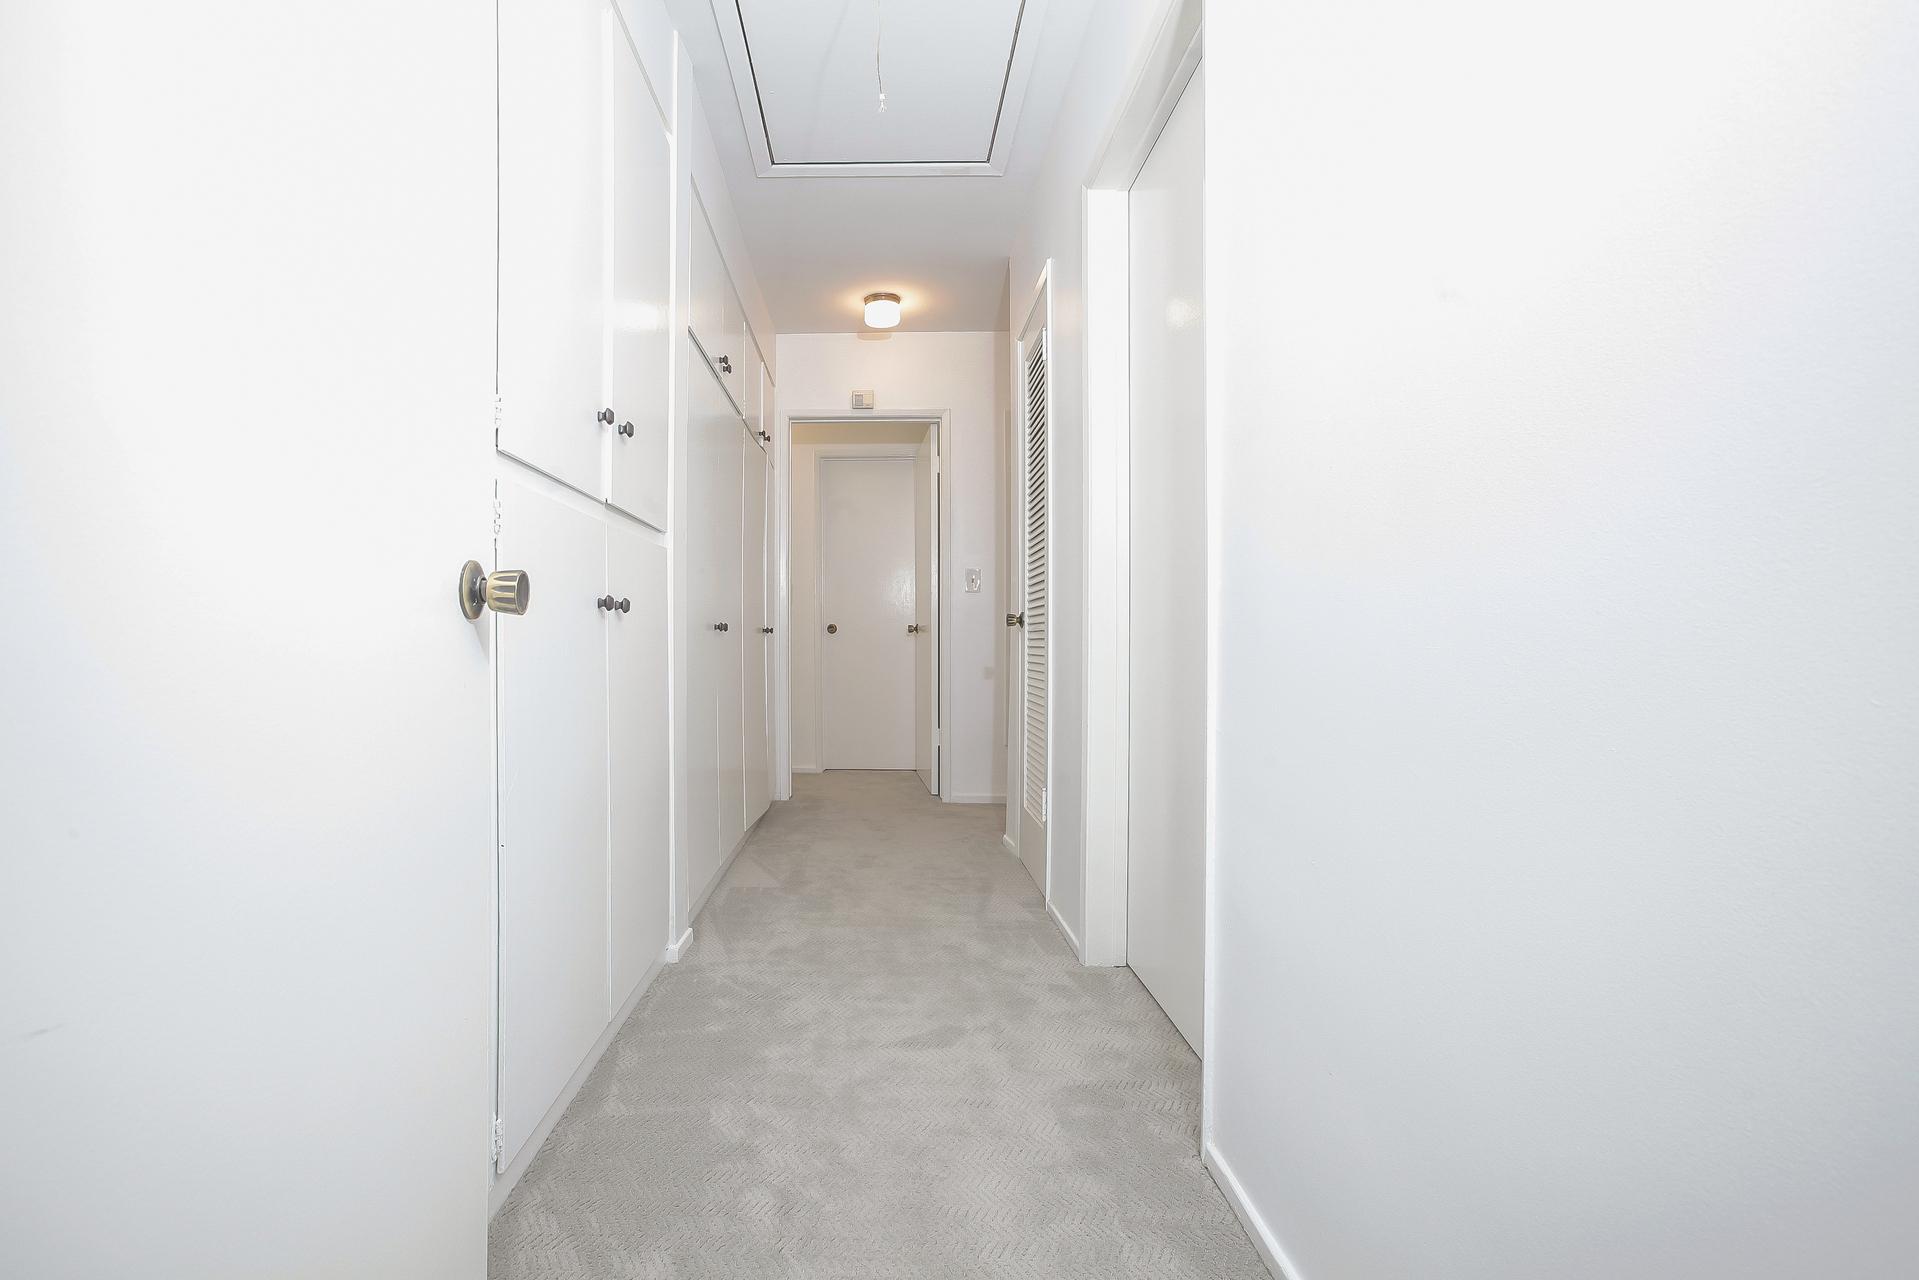 022-Hallway_leading_to_bedrooms-4443082-medium.jpg